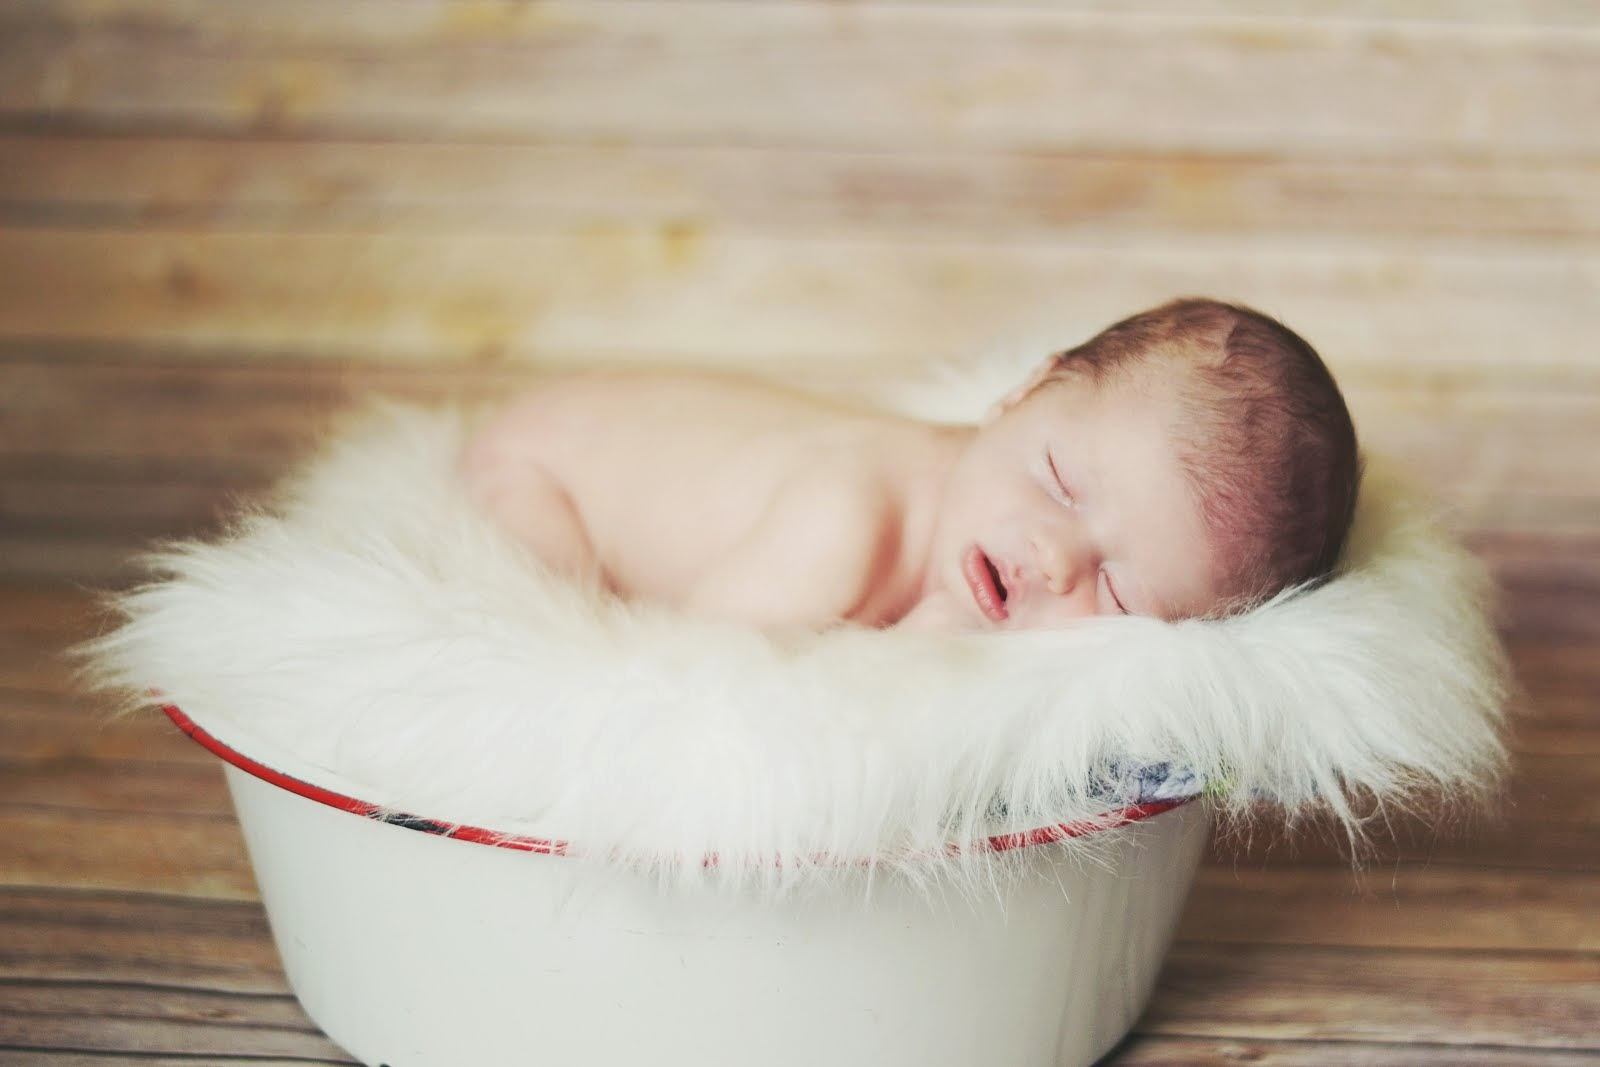 Baby Halden